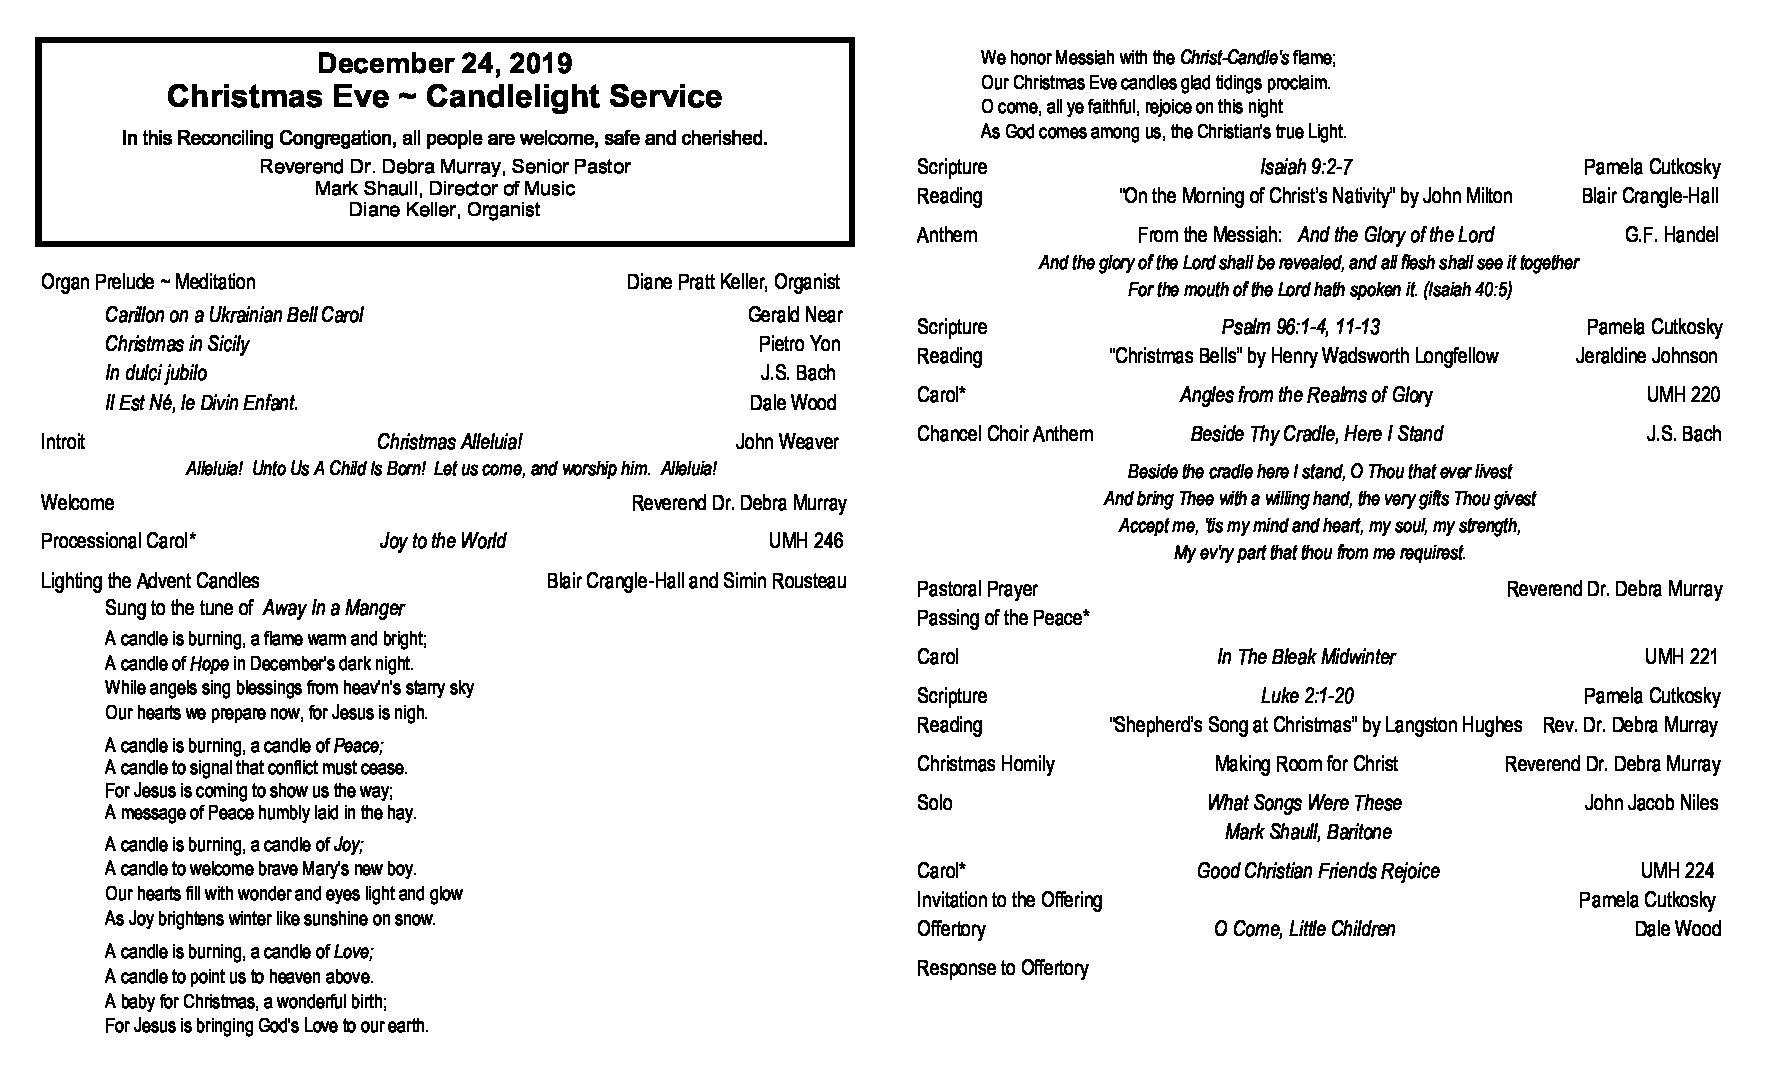 12.24.19 Candlelight Service (1)MAS A